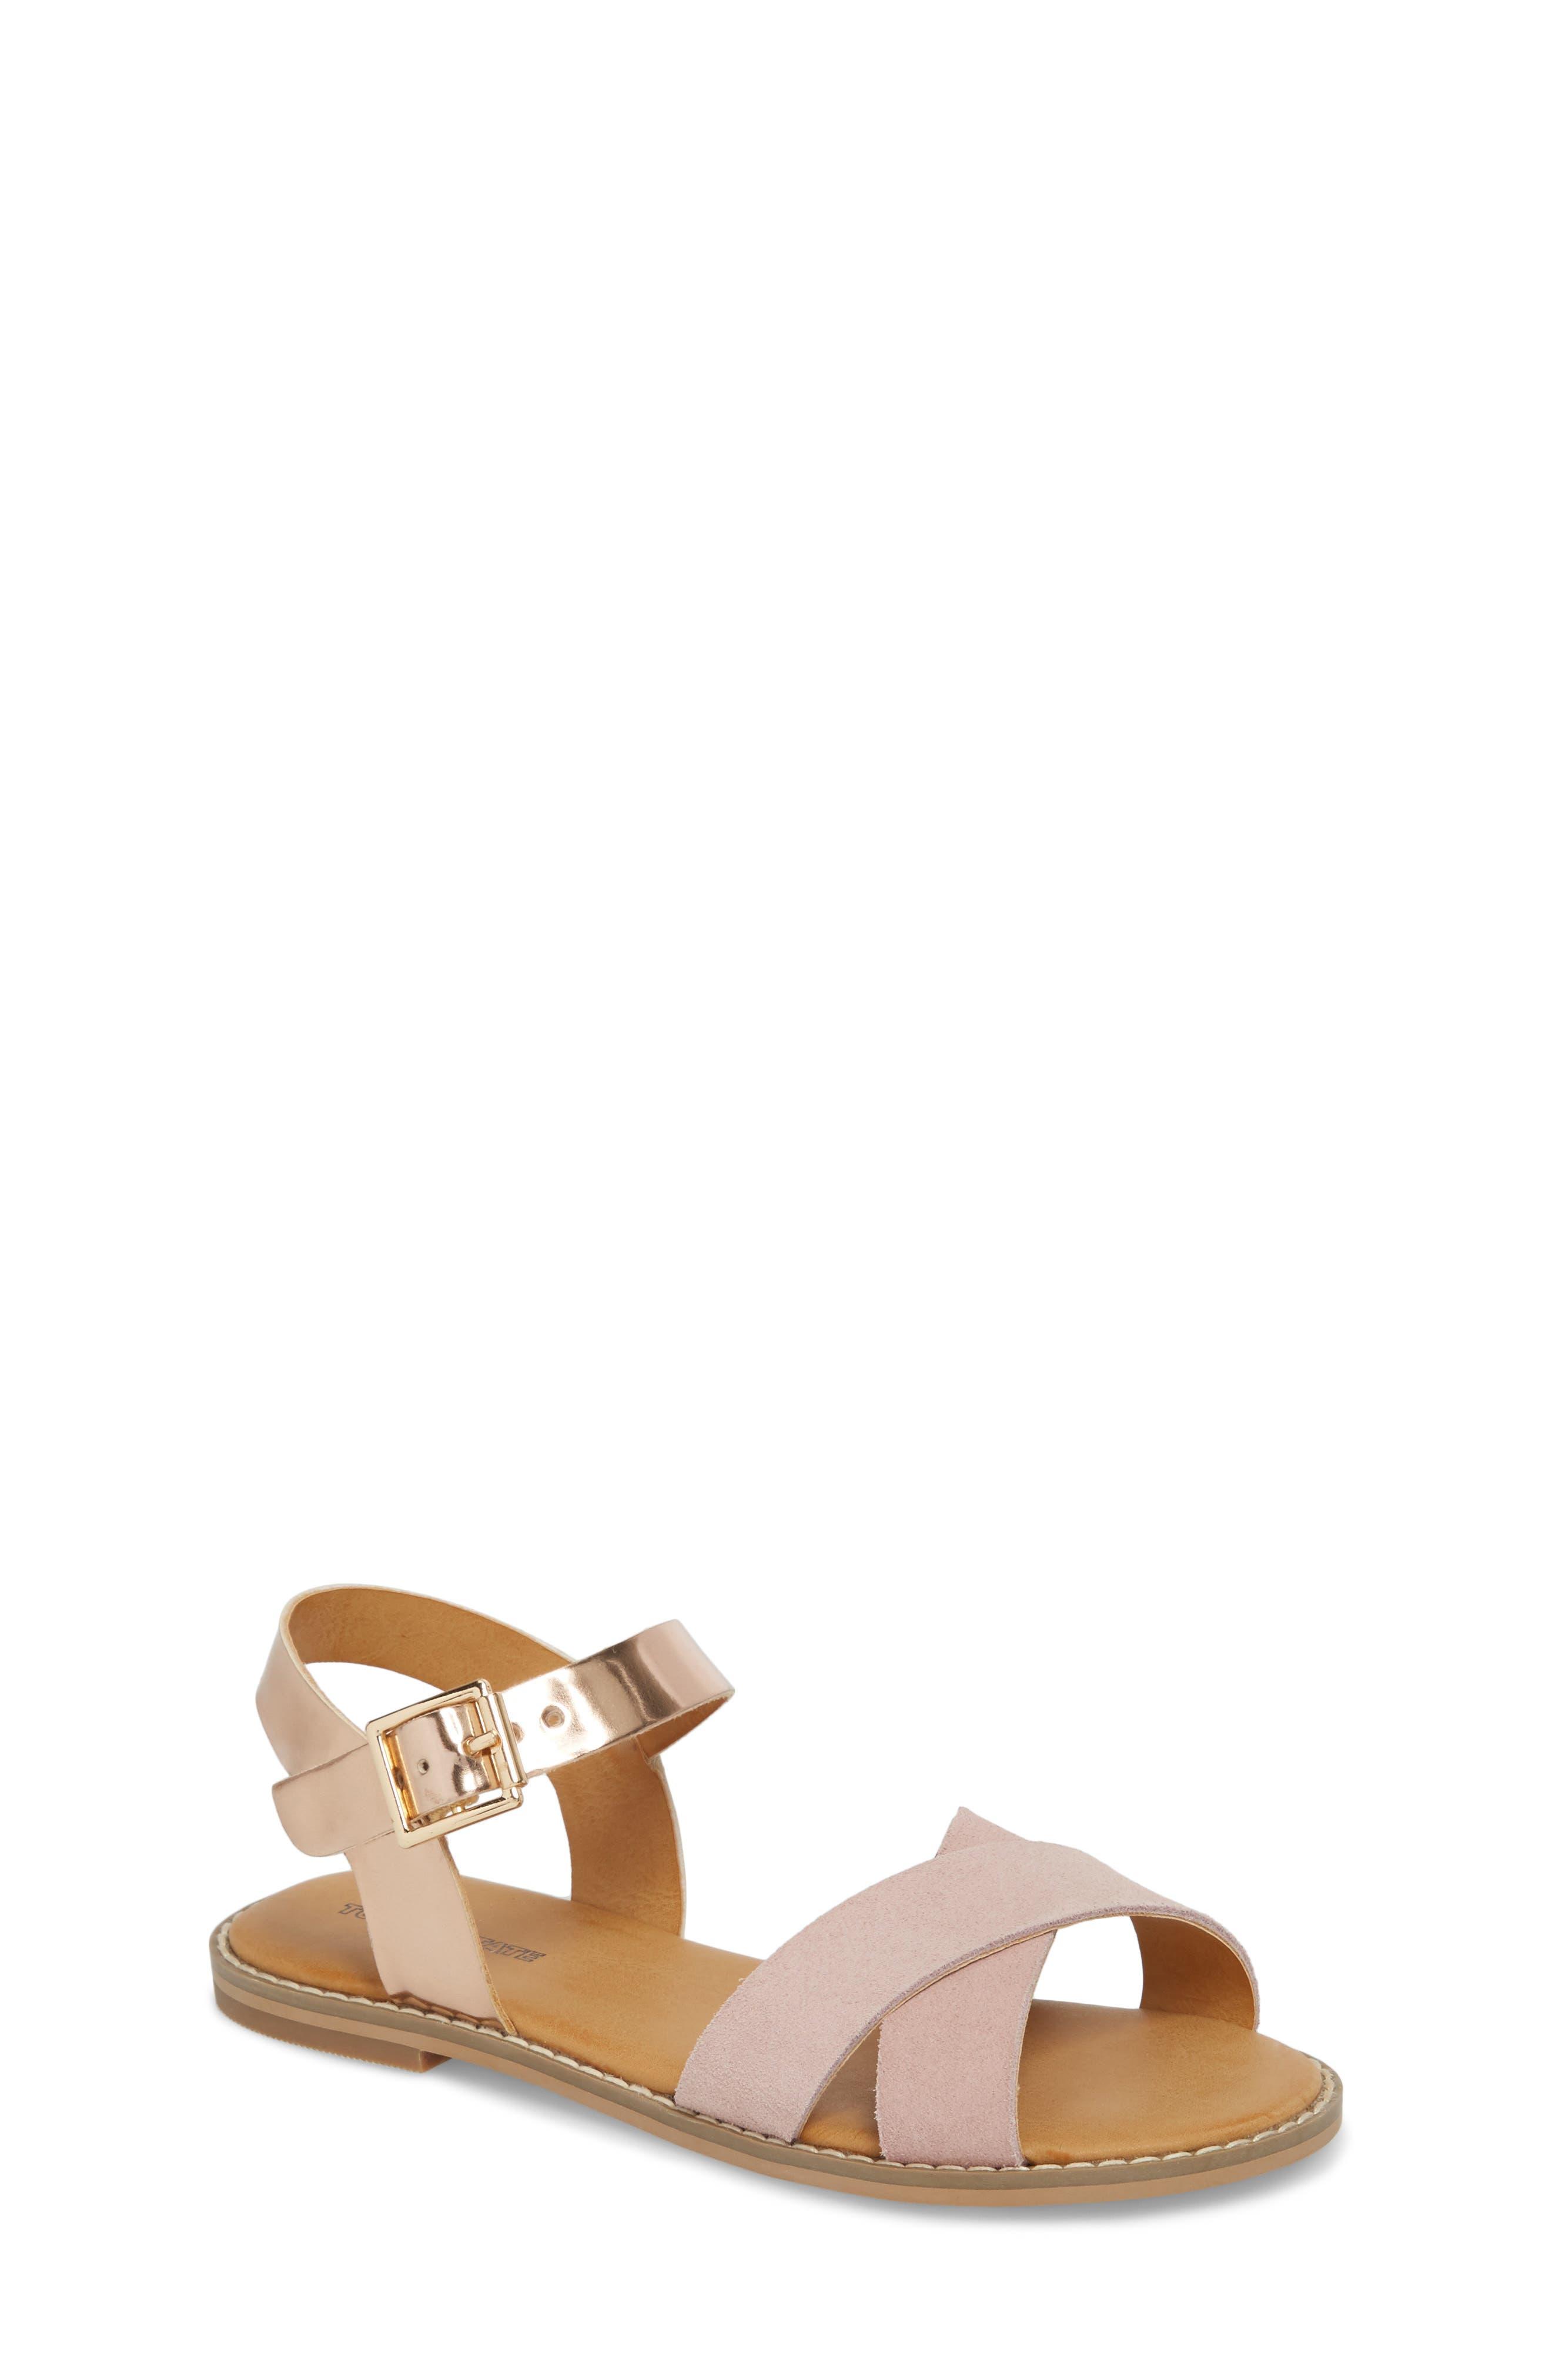 Arya Cross Strap Sandal,                         Main,                         color, Rose Gold Faux Lea